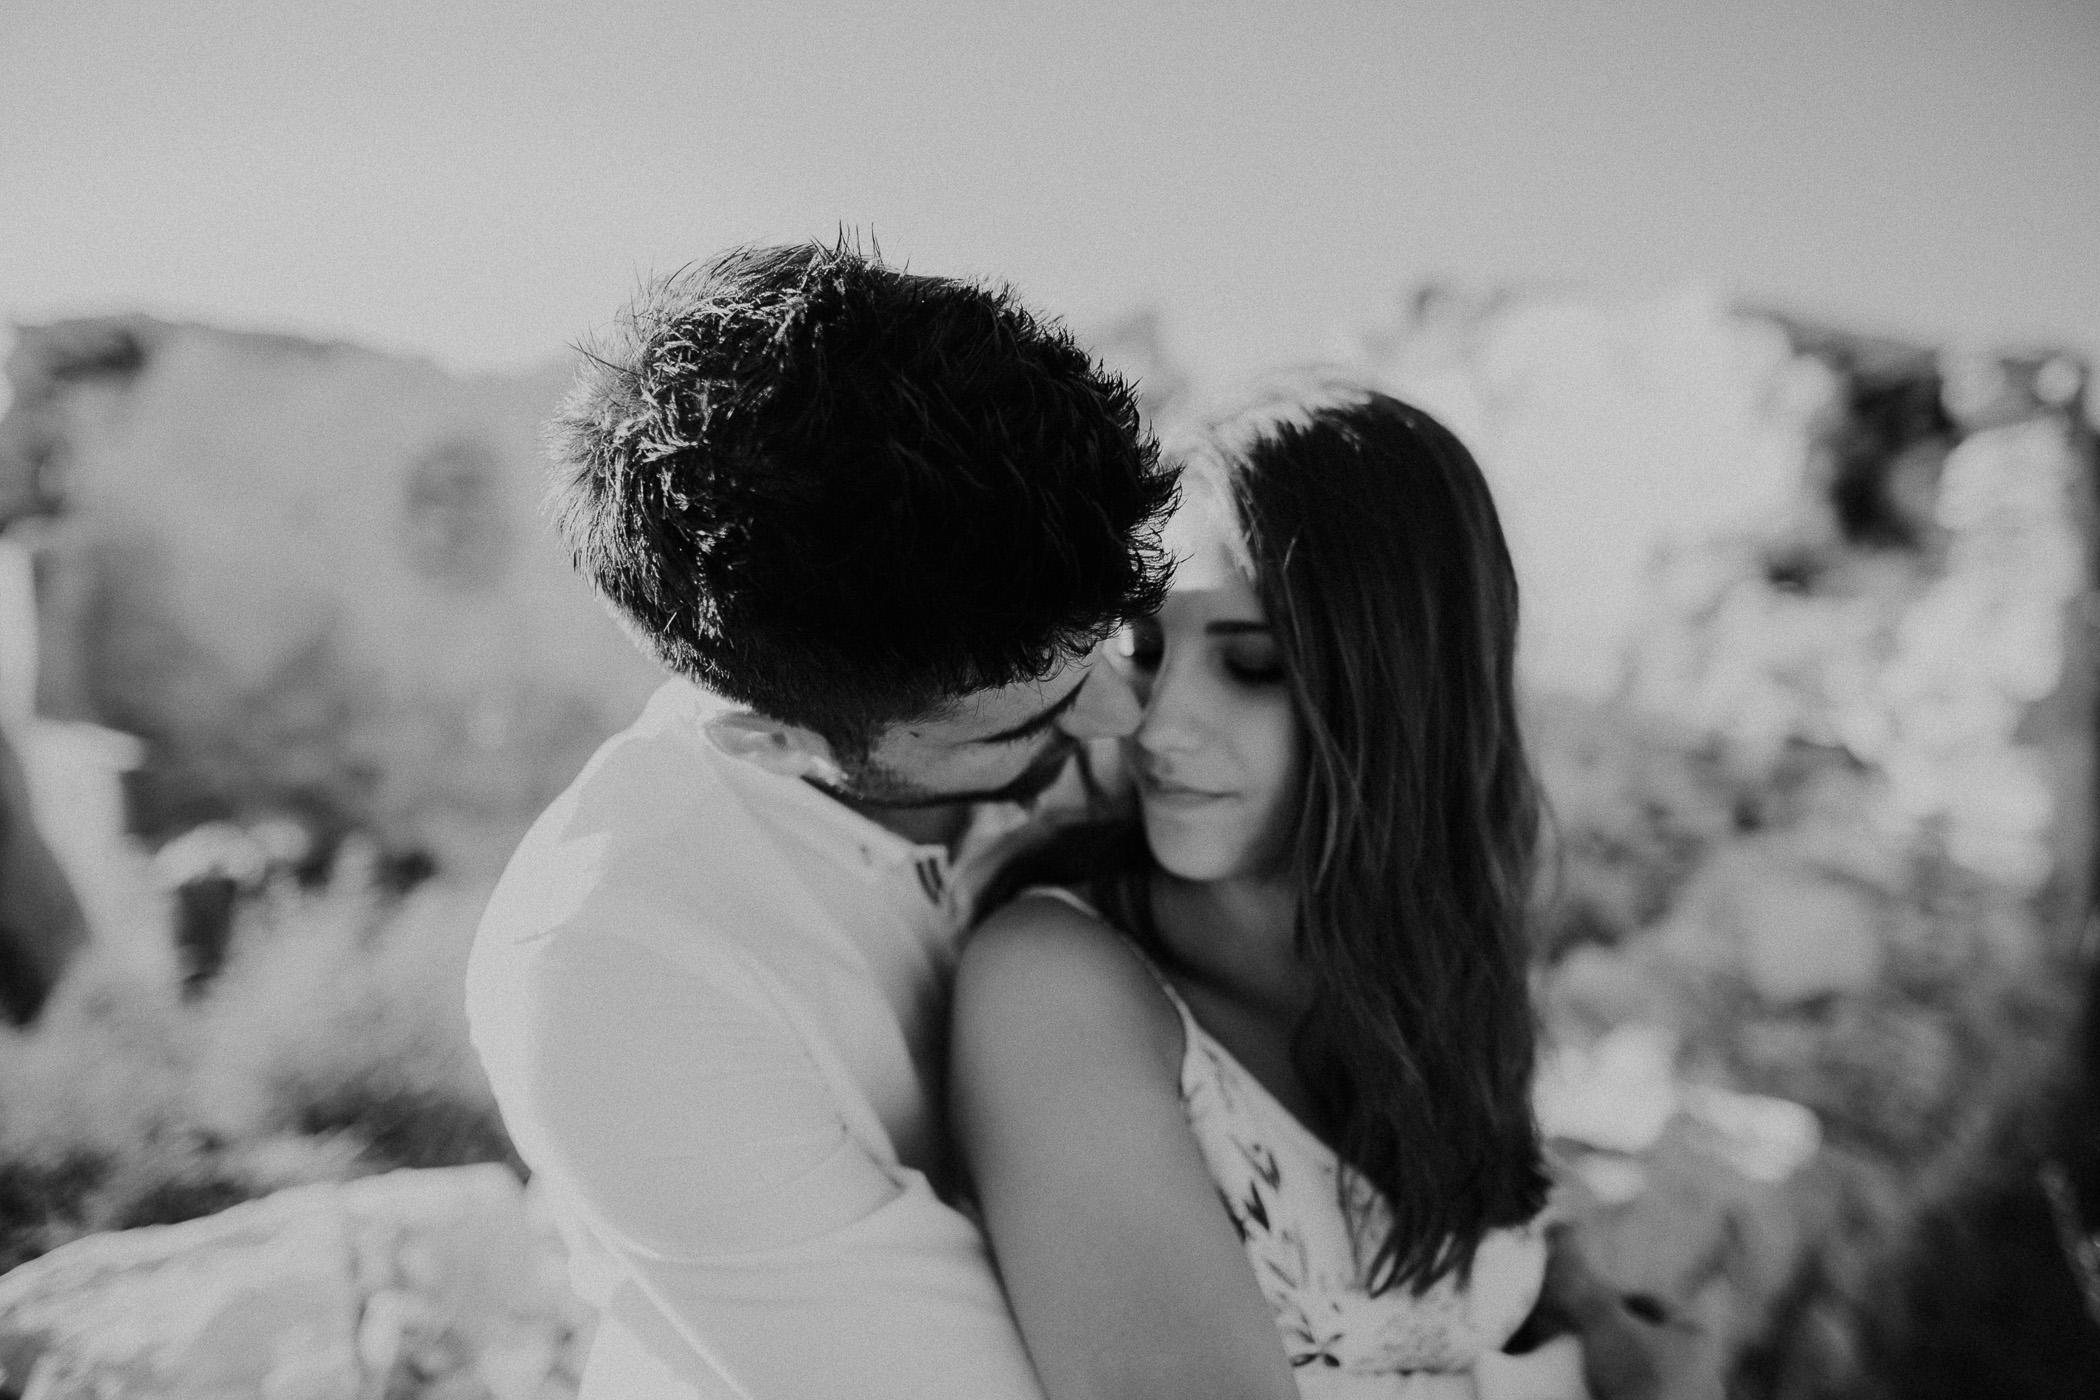 DanielaMarquardtPhotography_wedding_elopement_mallorca_spain_calapi_palma_lauraandtoni_388